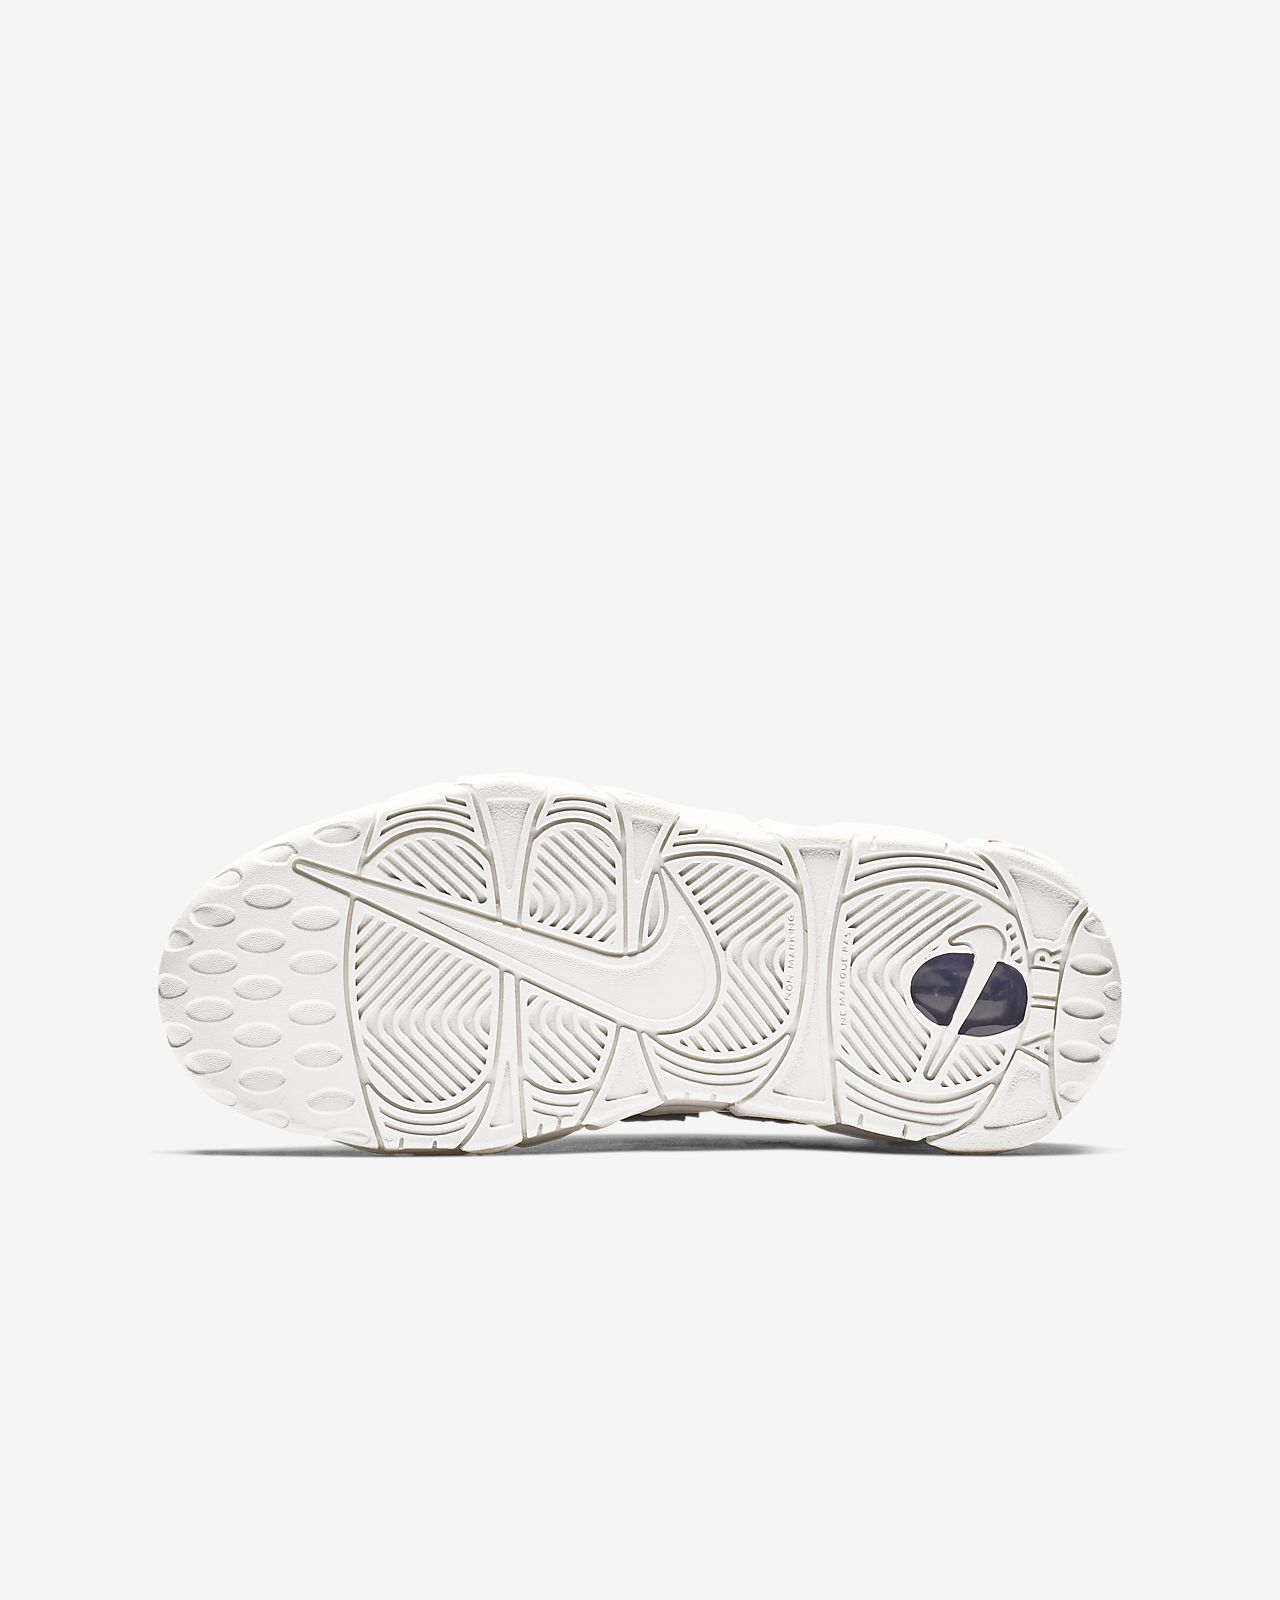 competitive price 5b5c5 c4671 ... Nike Air More Uptempo SE Big Kids  Shoe